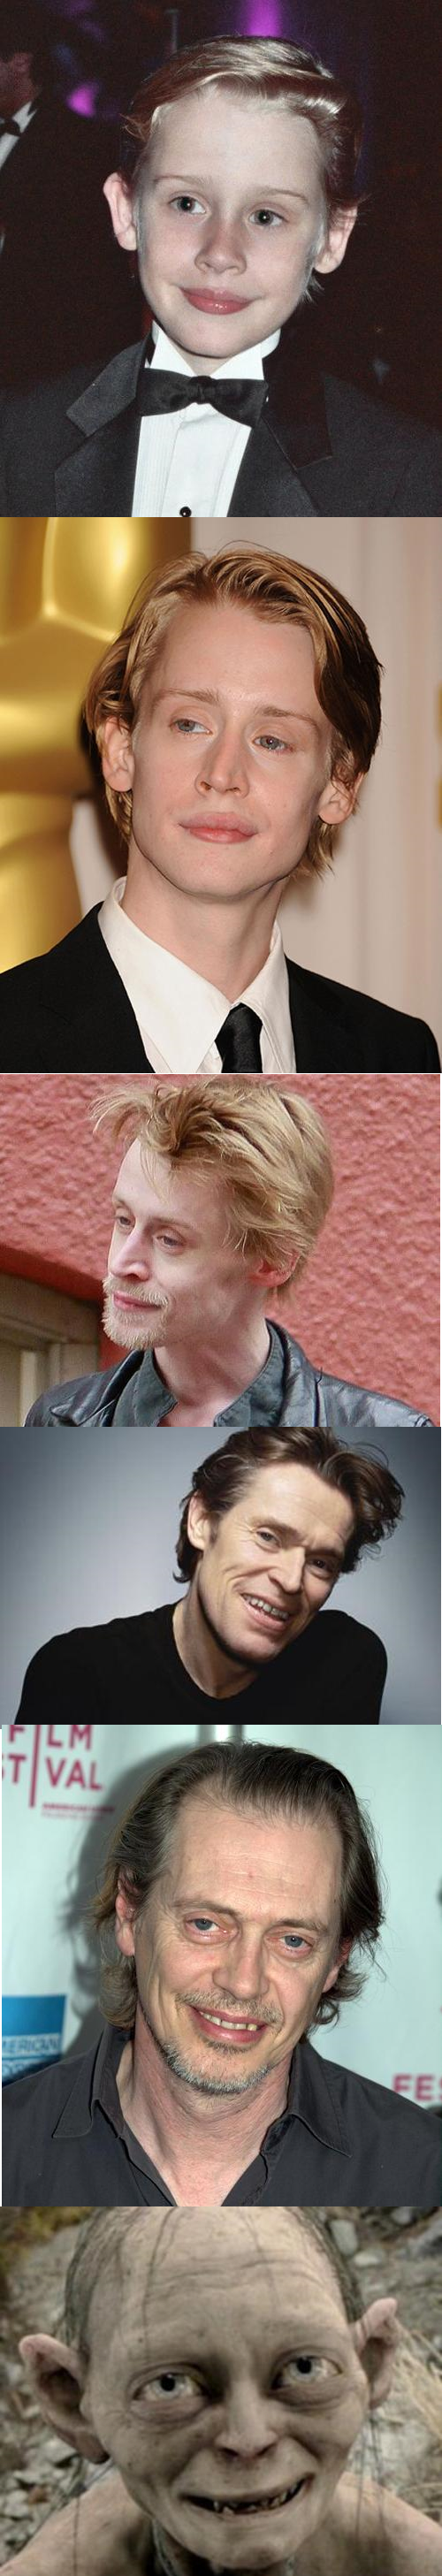 Evolution of Macaulay Culkin